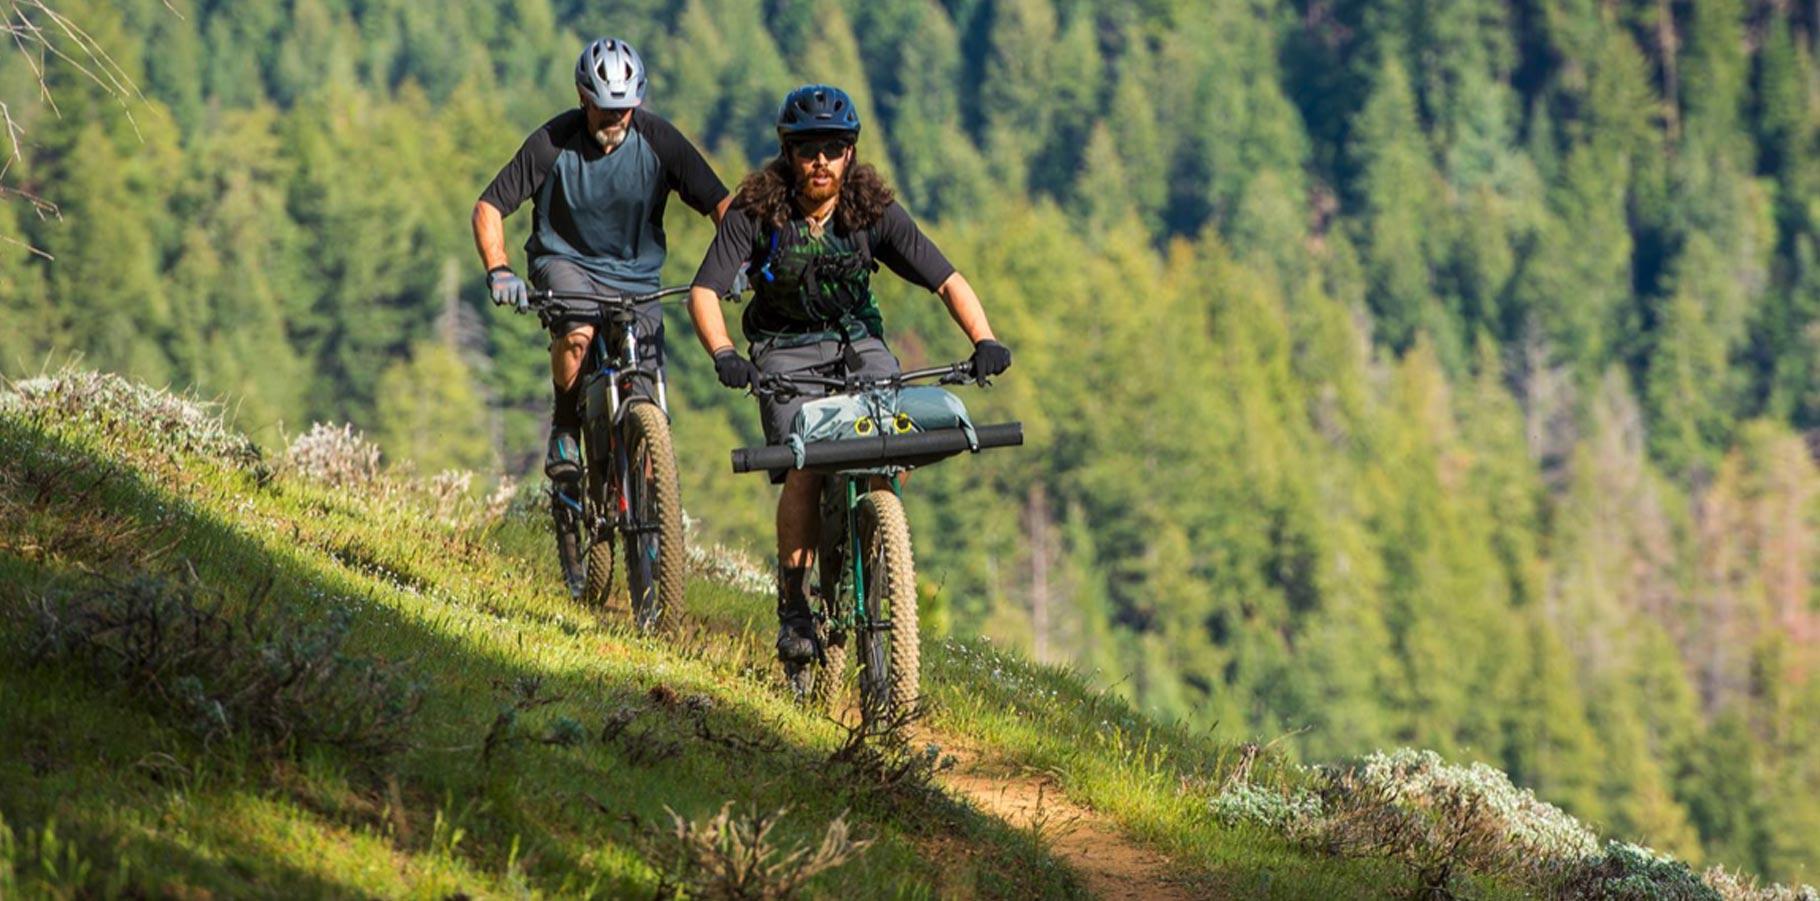 Apidura-expedicni-cyklo-brasny